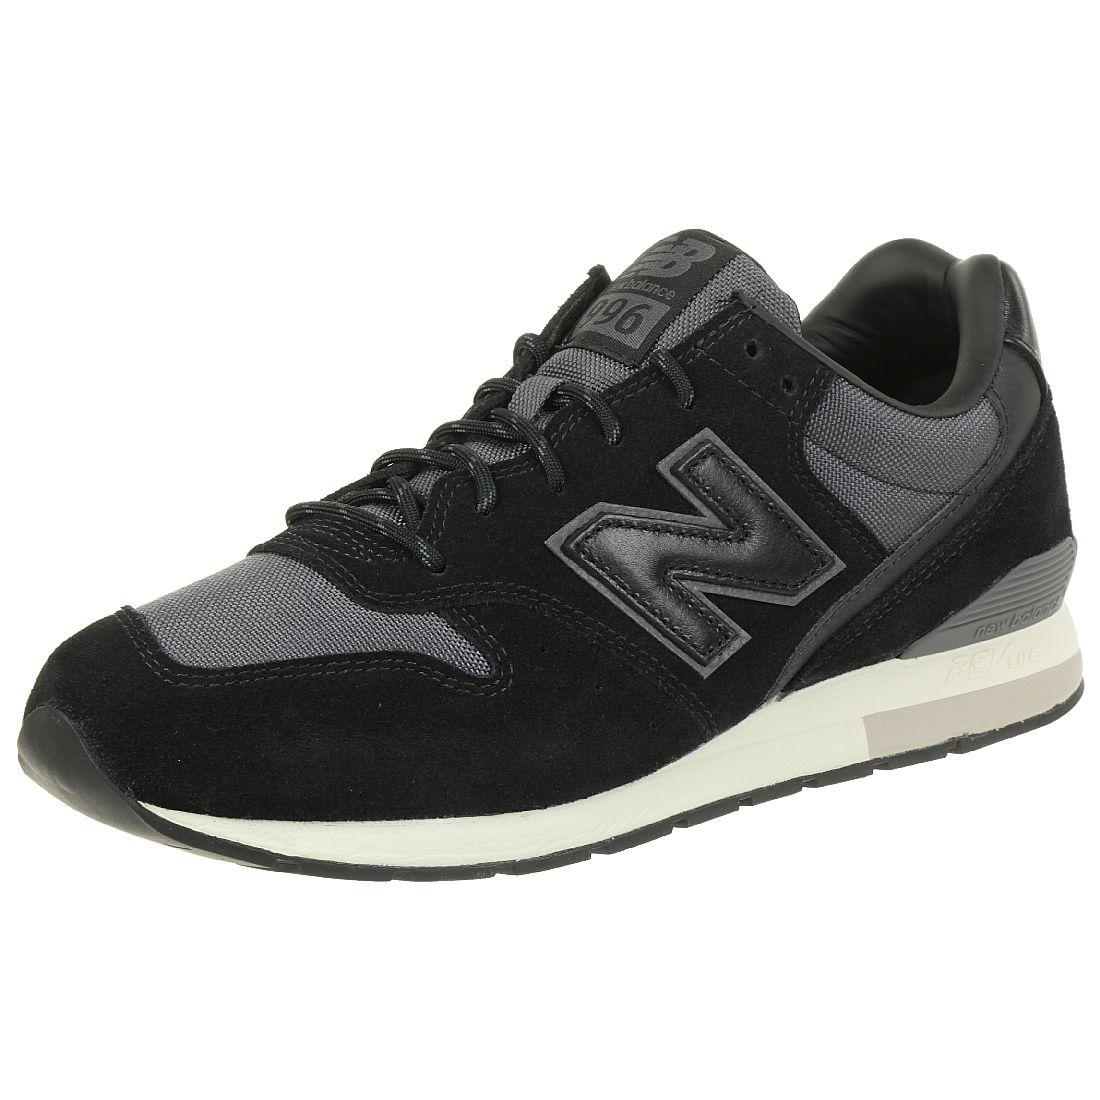 New Balance MRL996MS Classic Sneaker Herren Schuhe schwarz